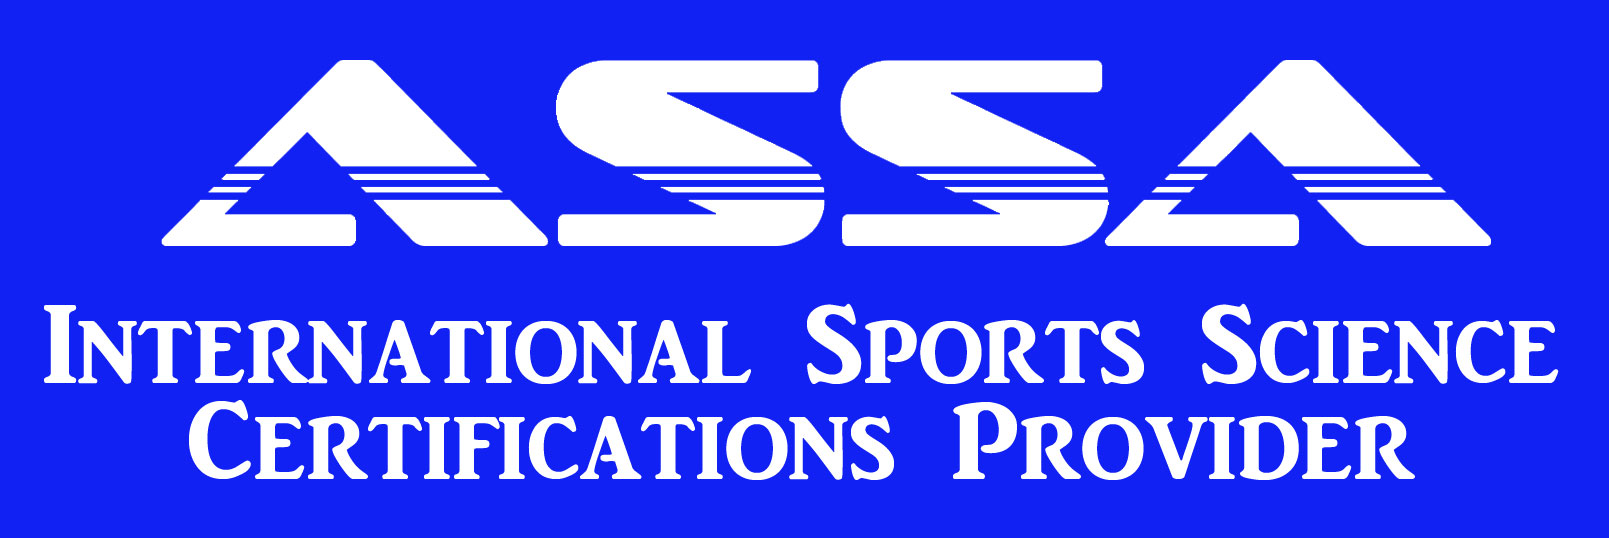 ASSA Sports